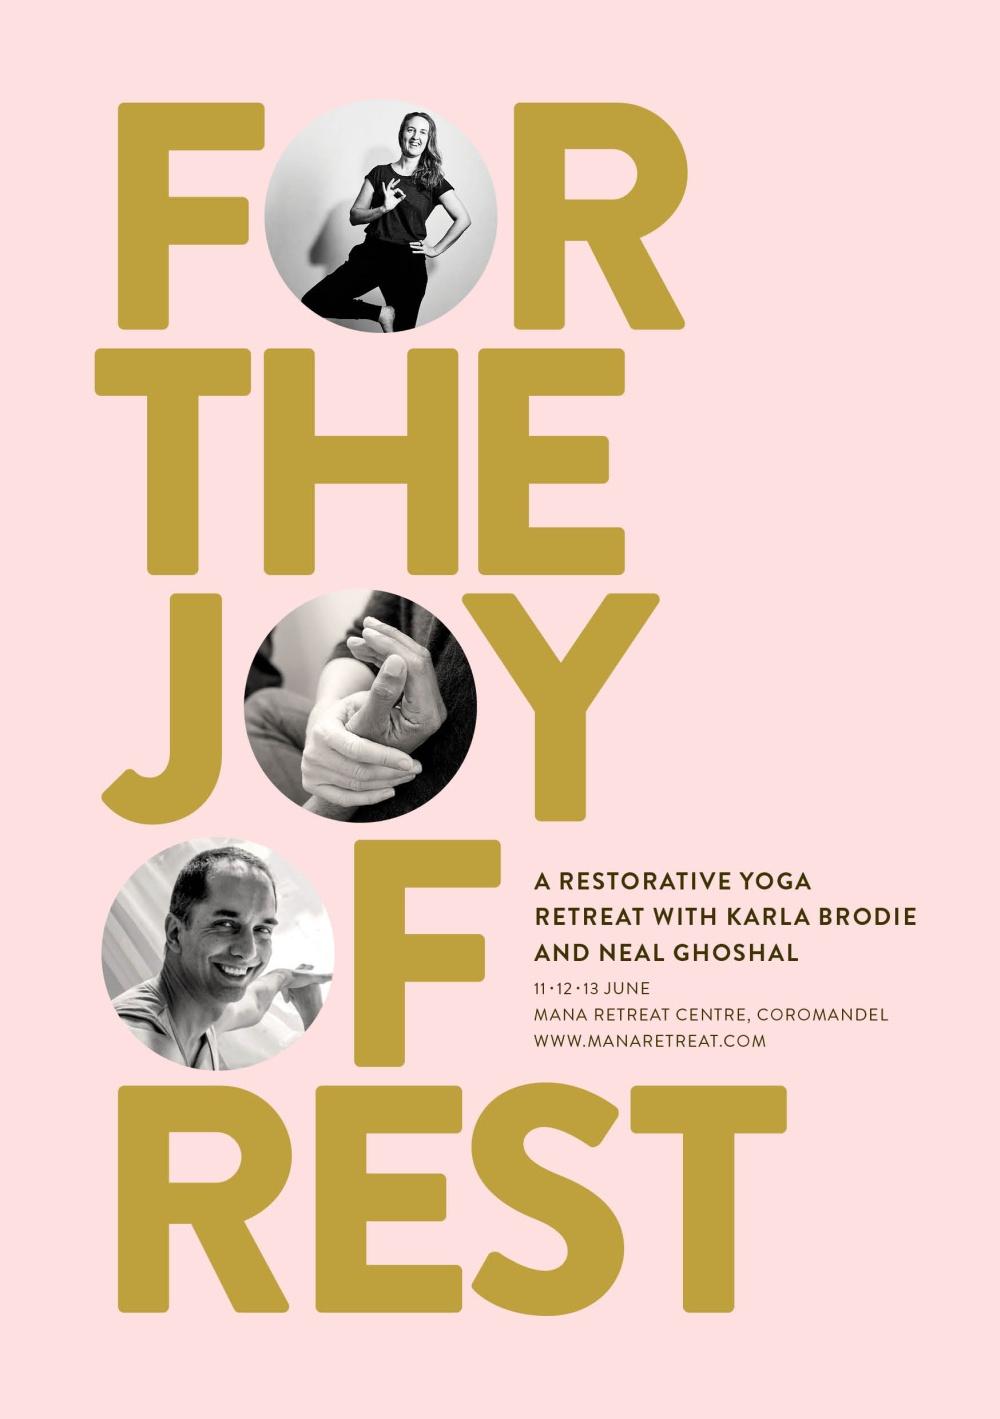 For the Joy of Rest - Restorative Yoga Retreat at Mana Retreat Centre, 11-13th June 2021